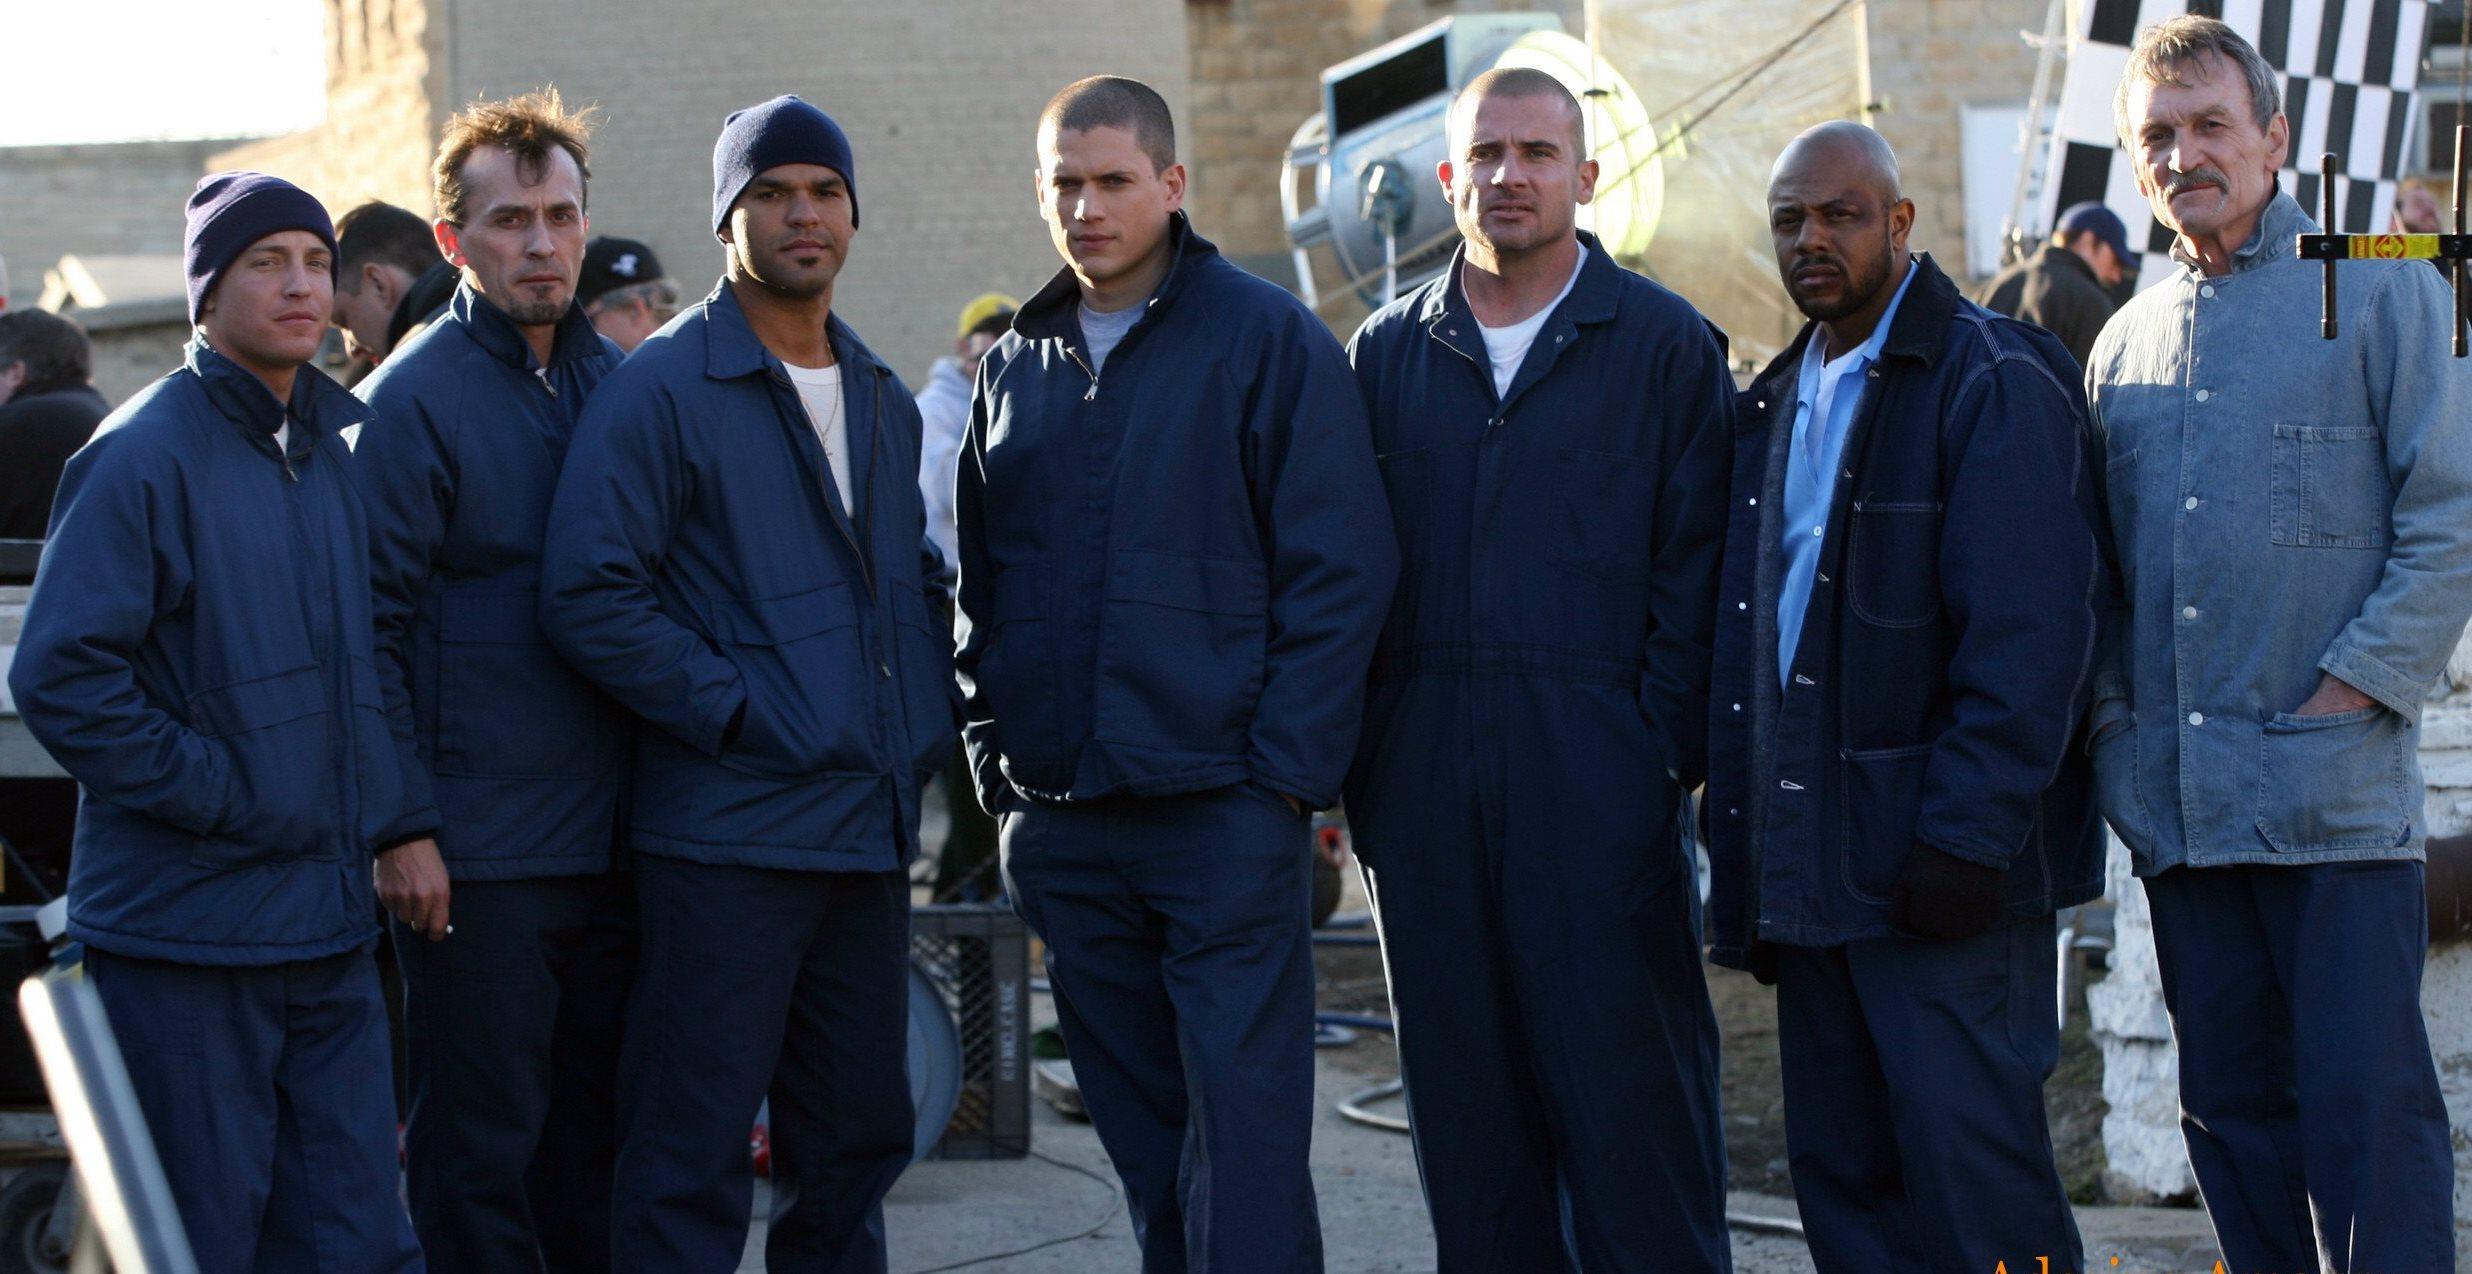 Personajes que se deseaban para la 5ta temporada de Prison Breack